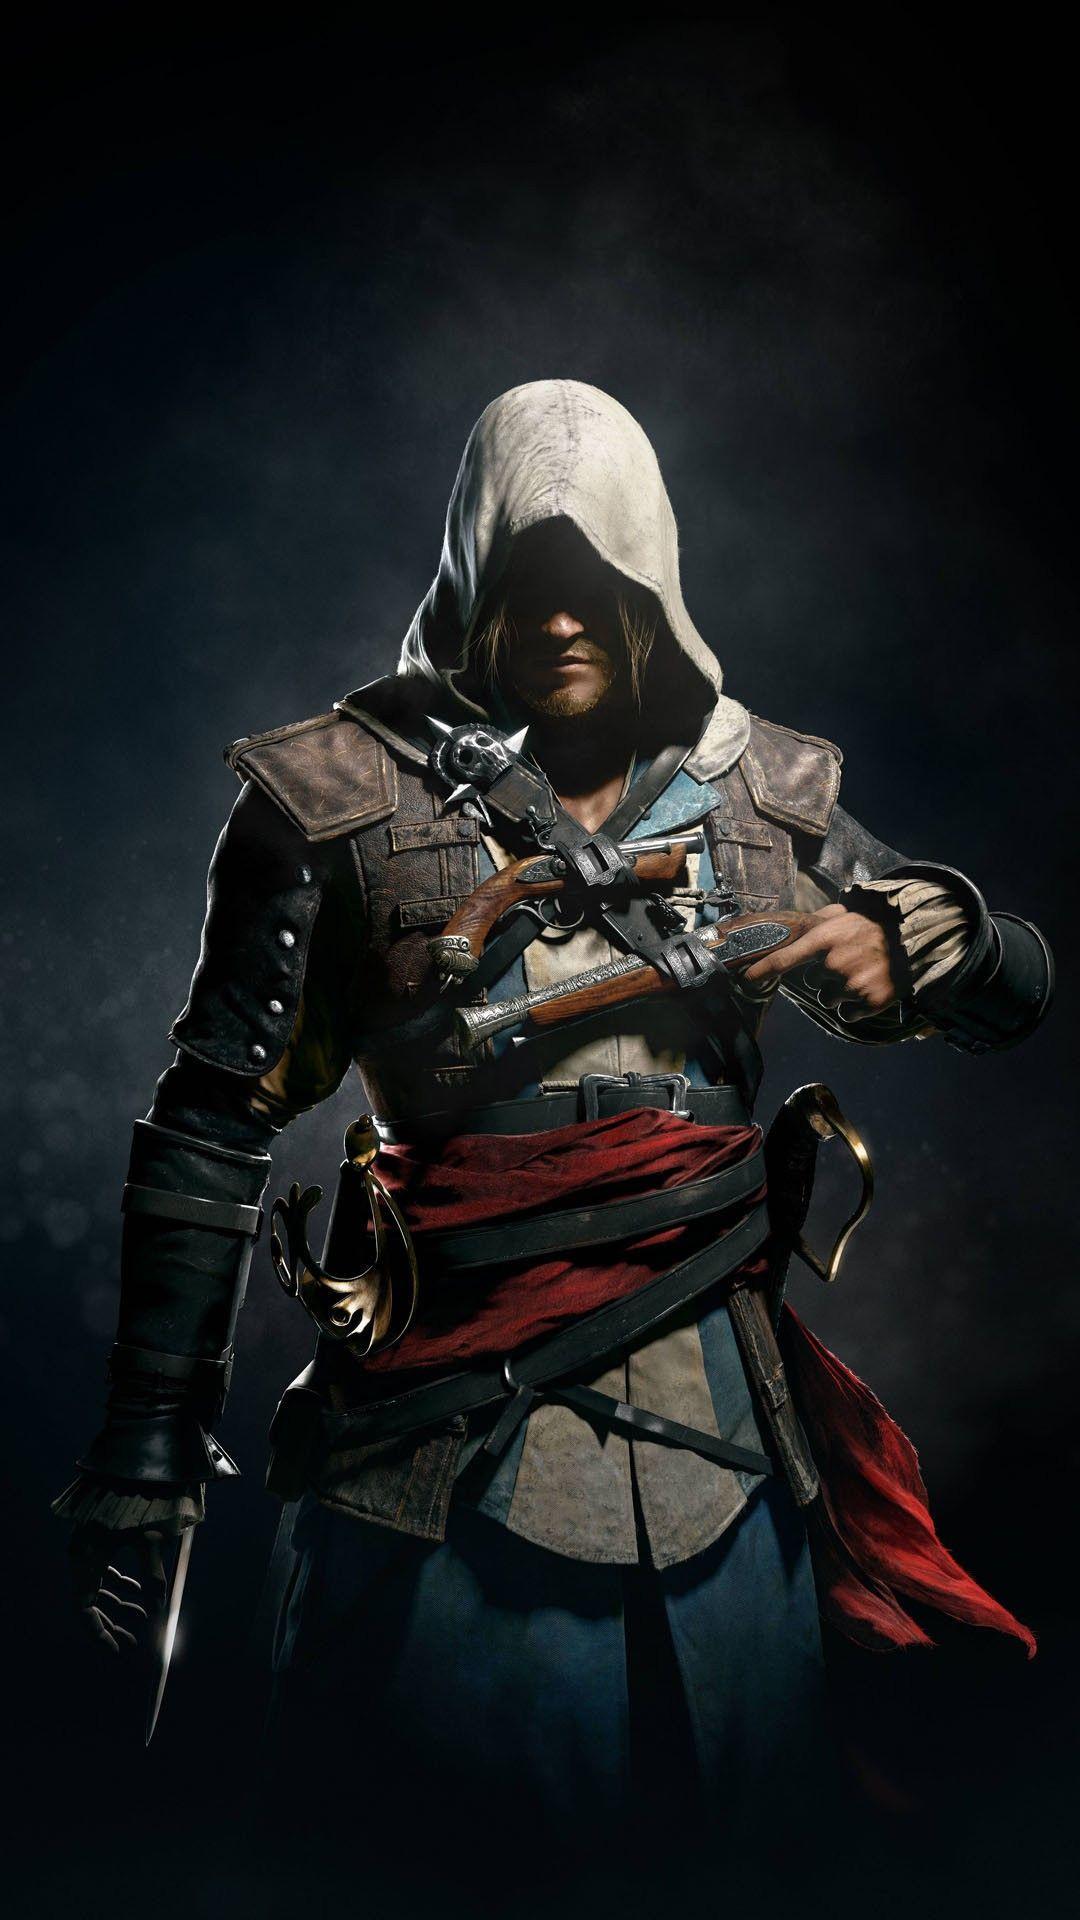 Assassin S Creed Wallpaper Assassins Creed Black Flag Assassin S Creed Wallpaper Assassin S Creed Black